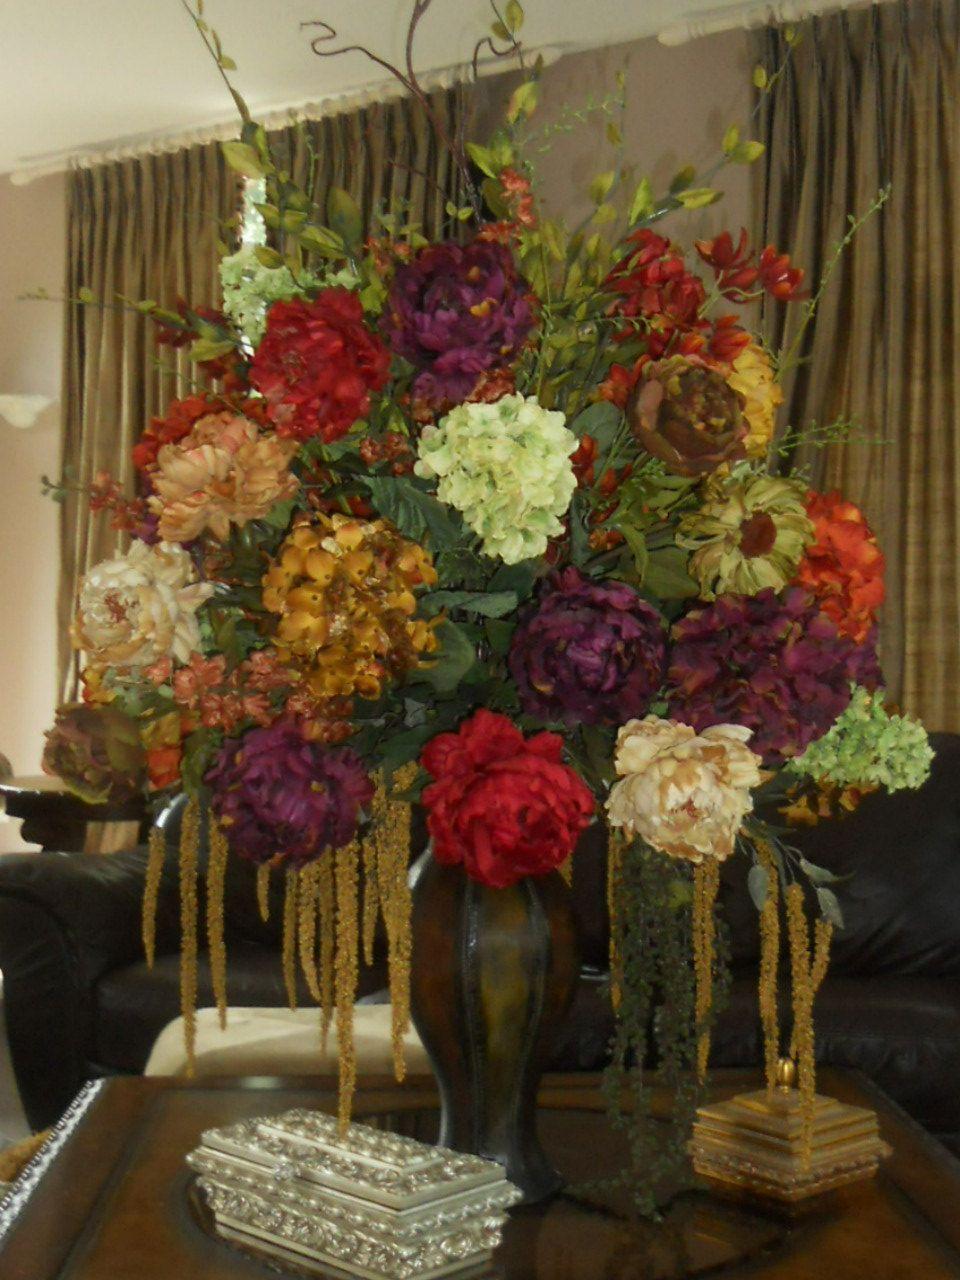 Stunning Hotel Style Designer Silk Floral Arrangement For The Home